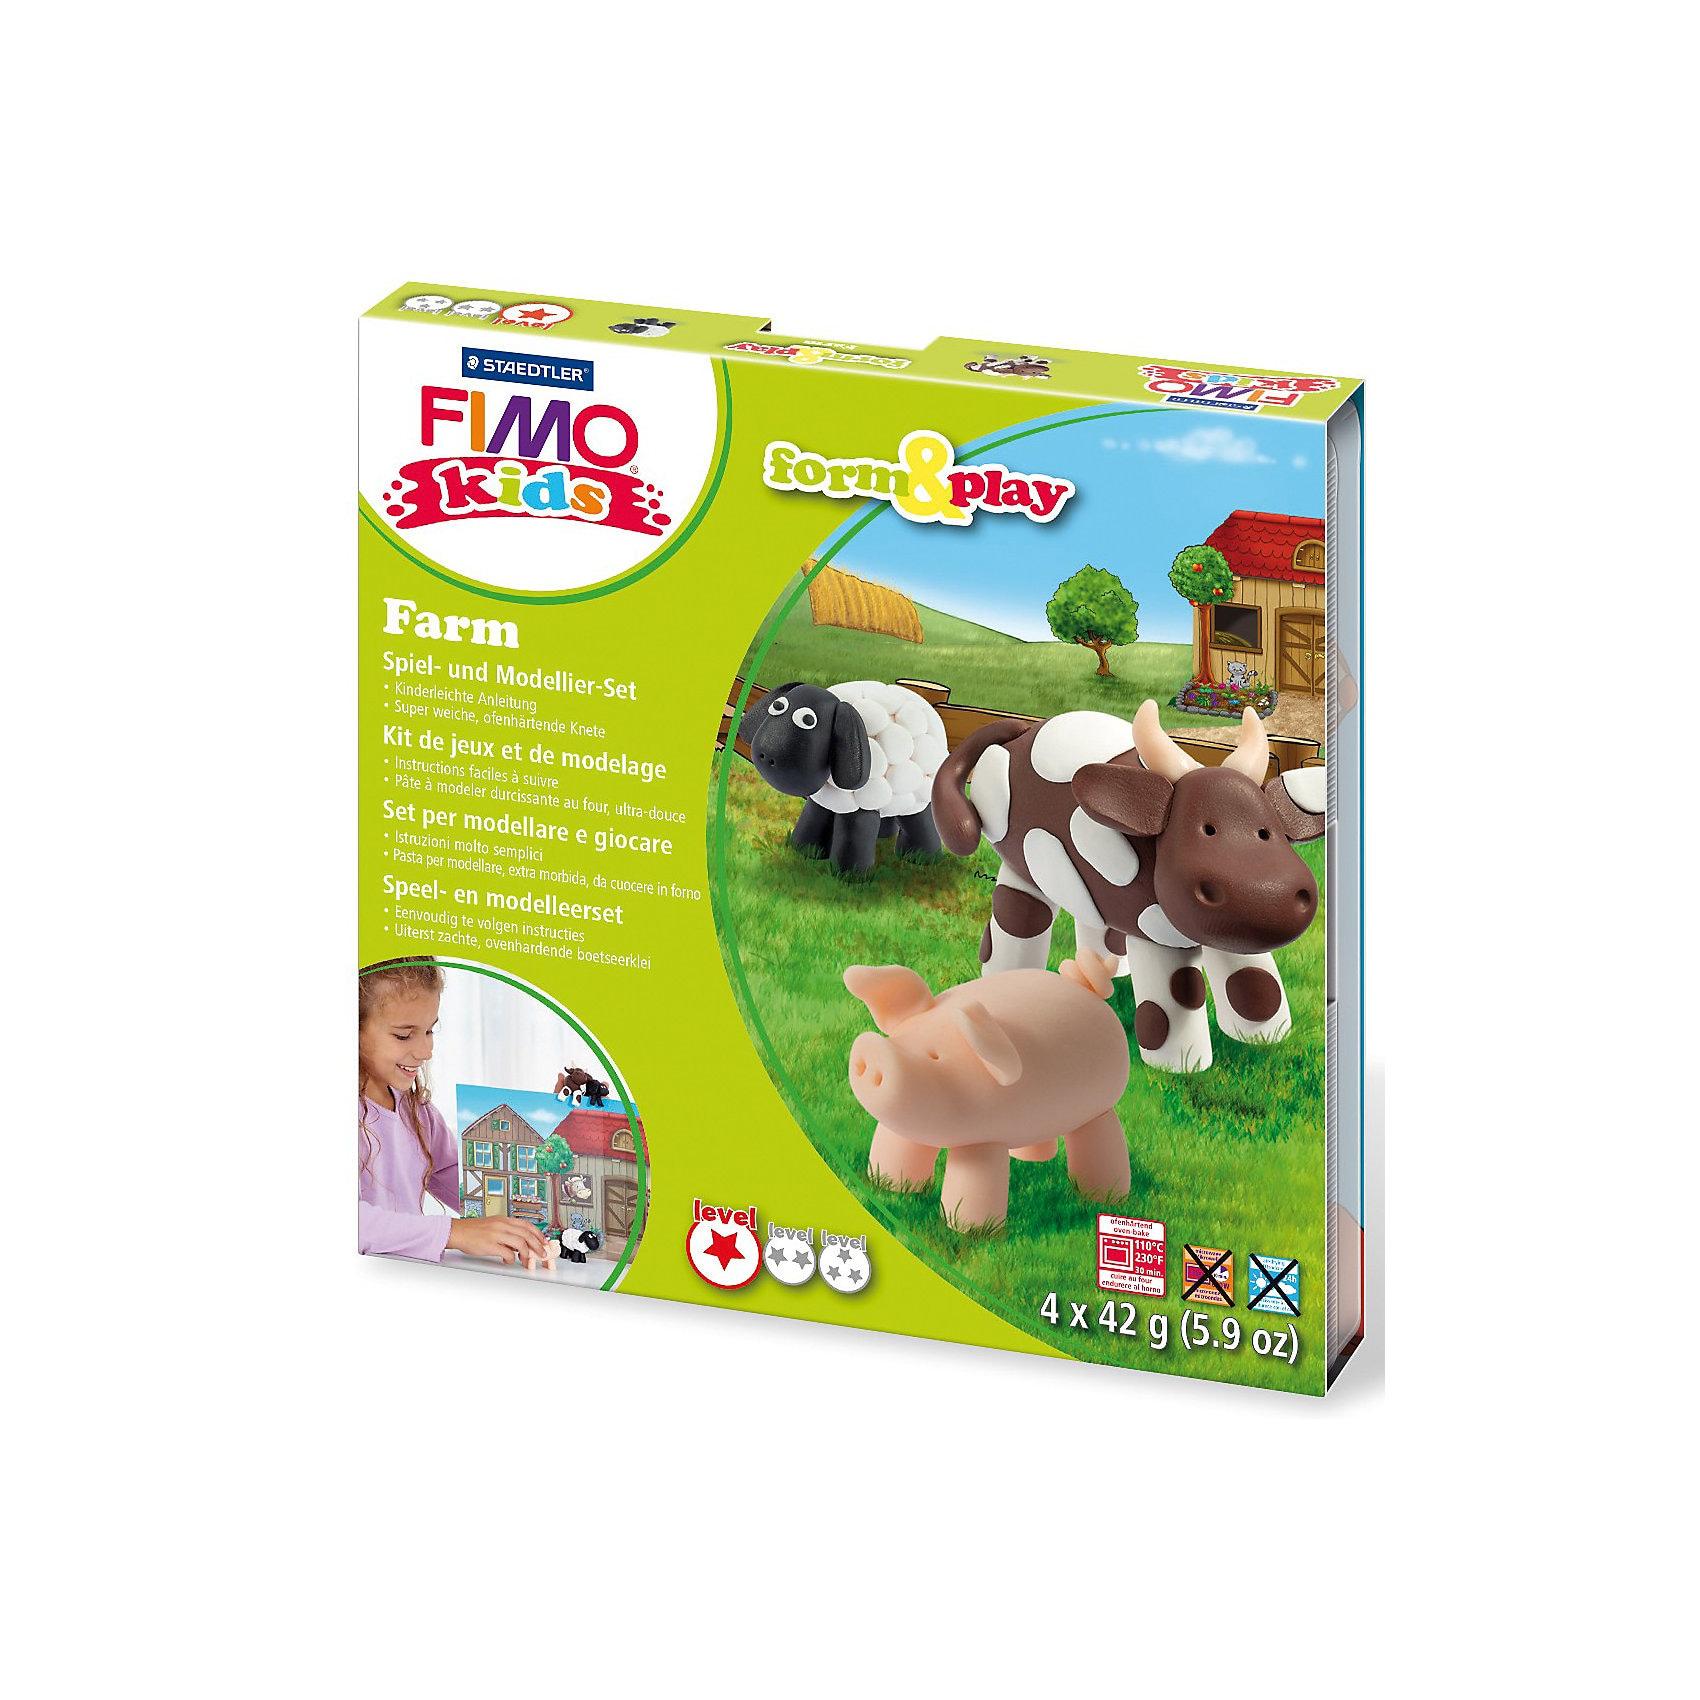 Staedtler Fimo kids Form Play Farm